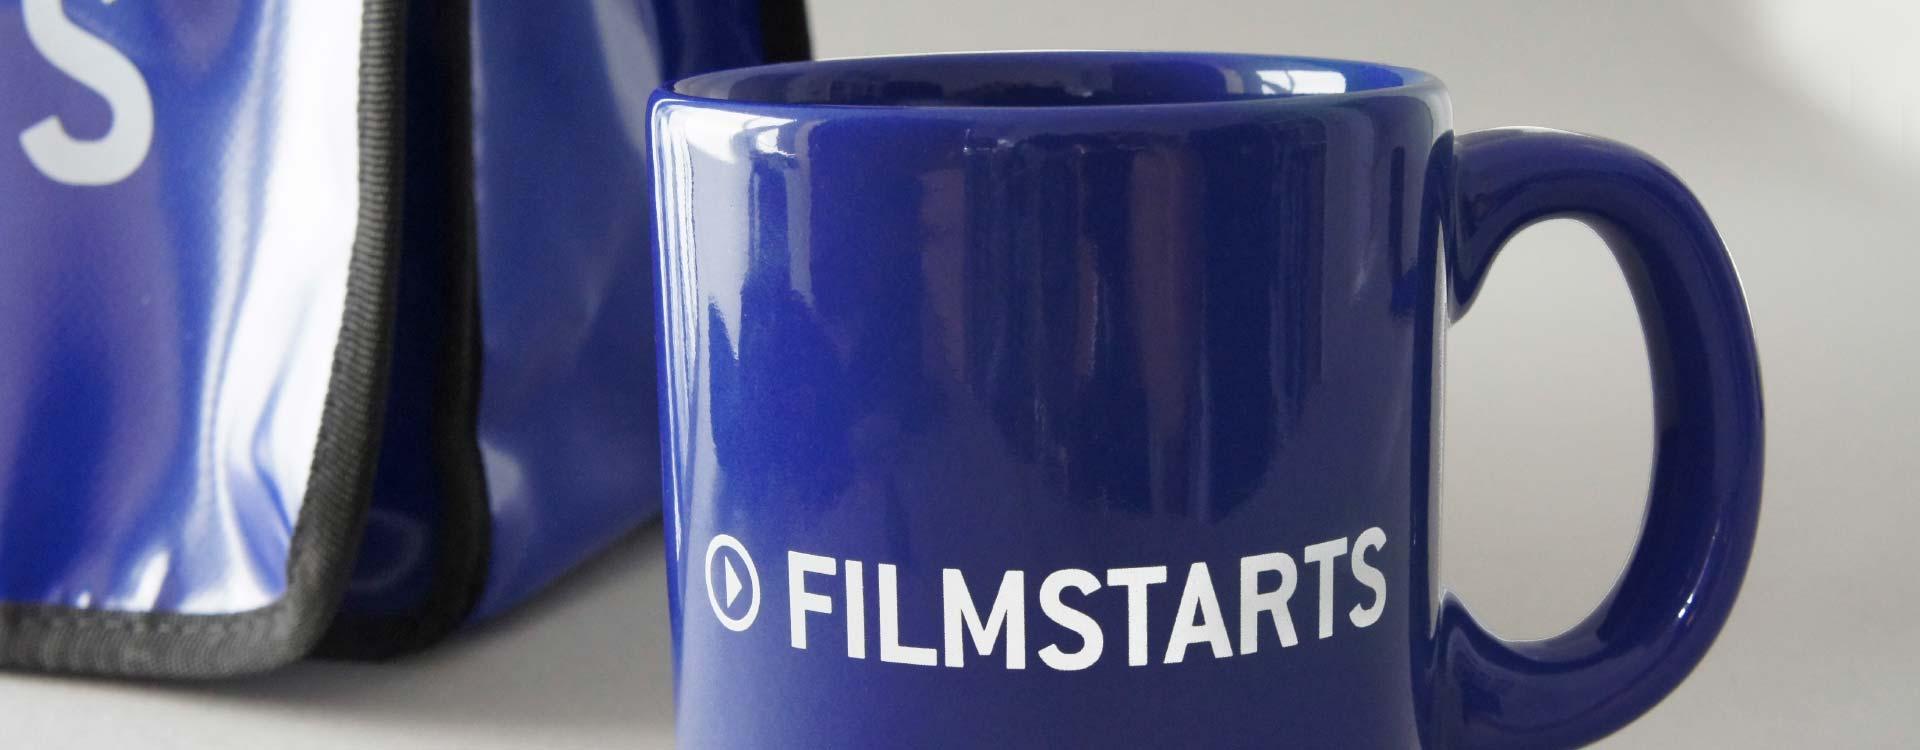 Tasse mit dem Logo Filmstarts